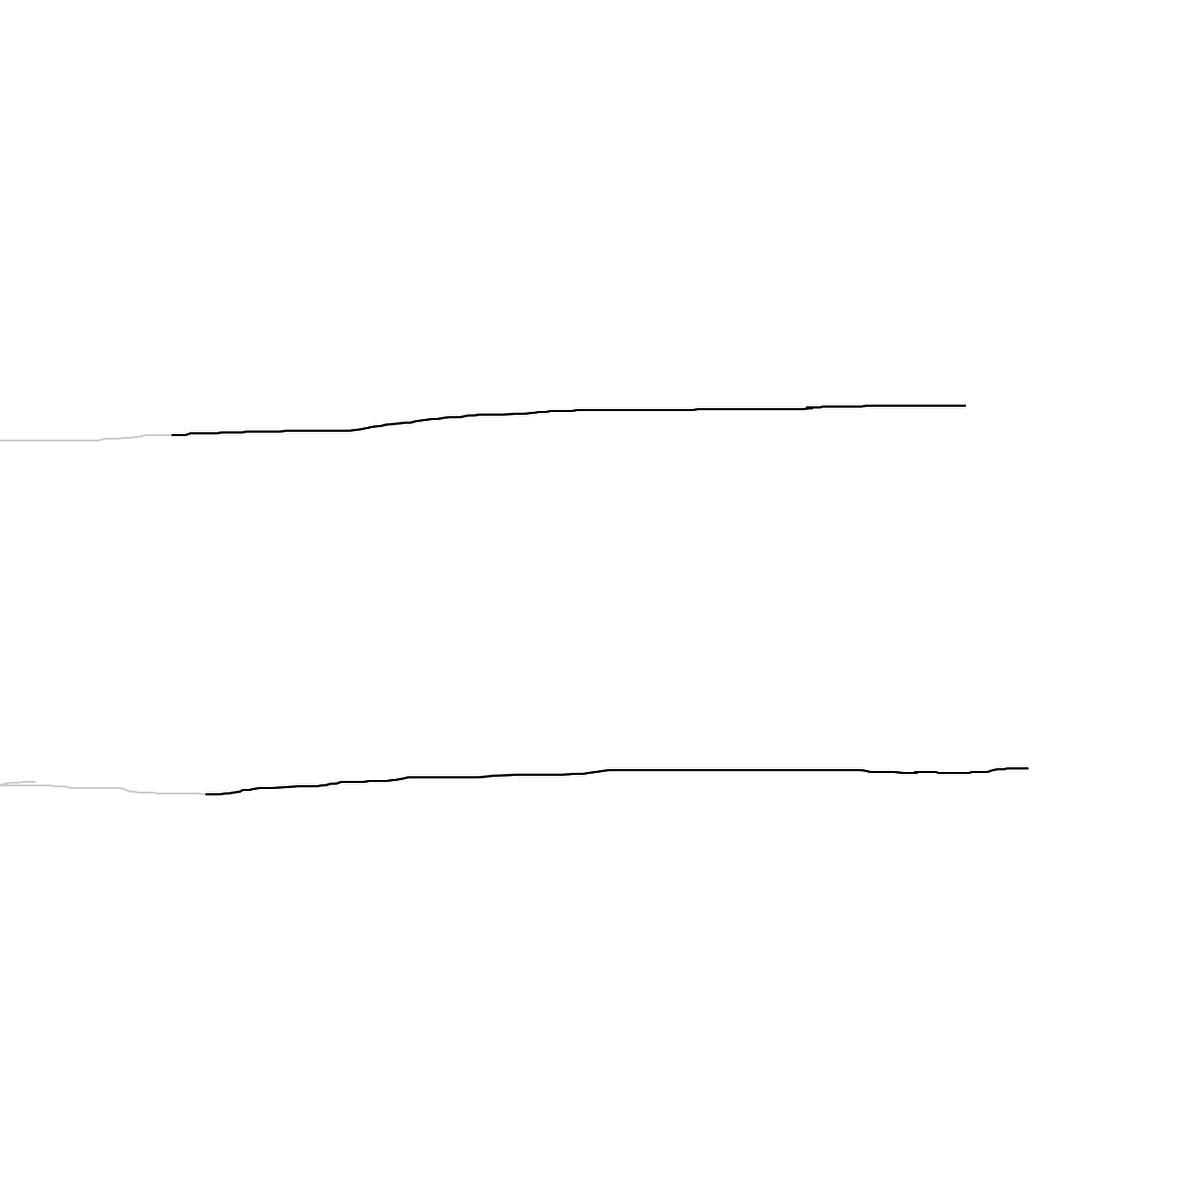 BAAAM drawing#10653 lat:51.0362739562988300lng: -114.0524444580078100